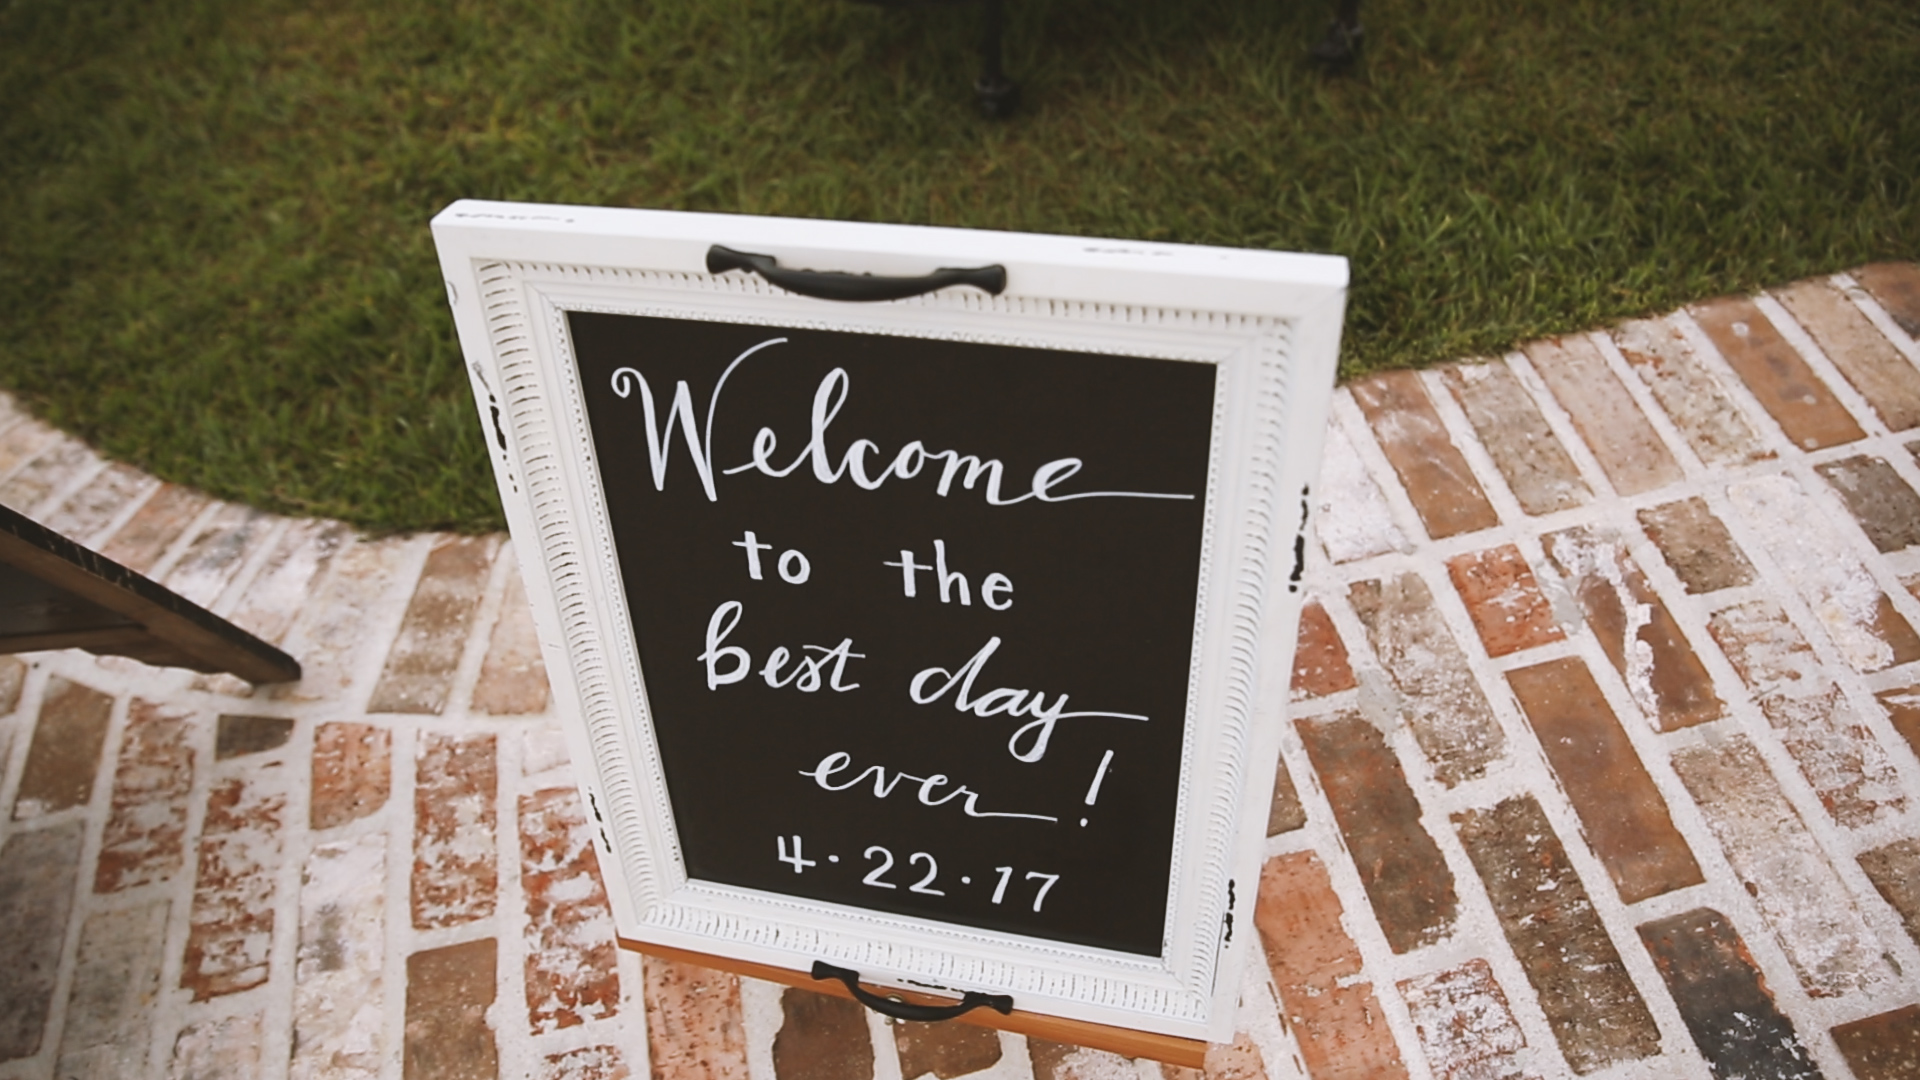 Amanda and Hayden_The White Magnolia Farm Weddings_New Orleans videographer_Wedding ceremony sign